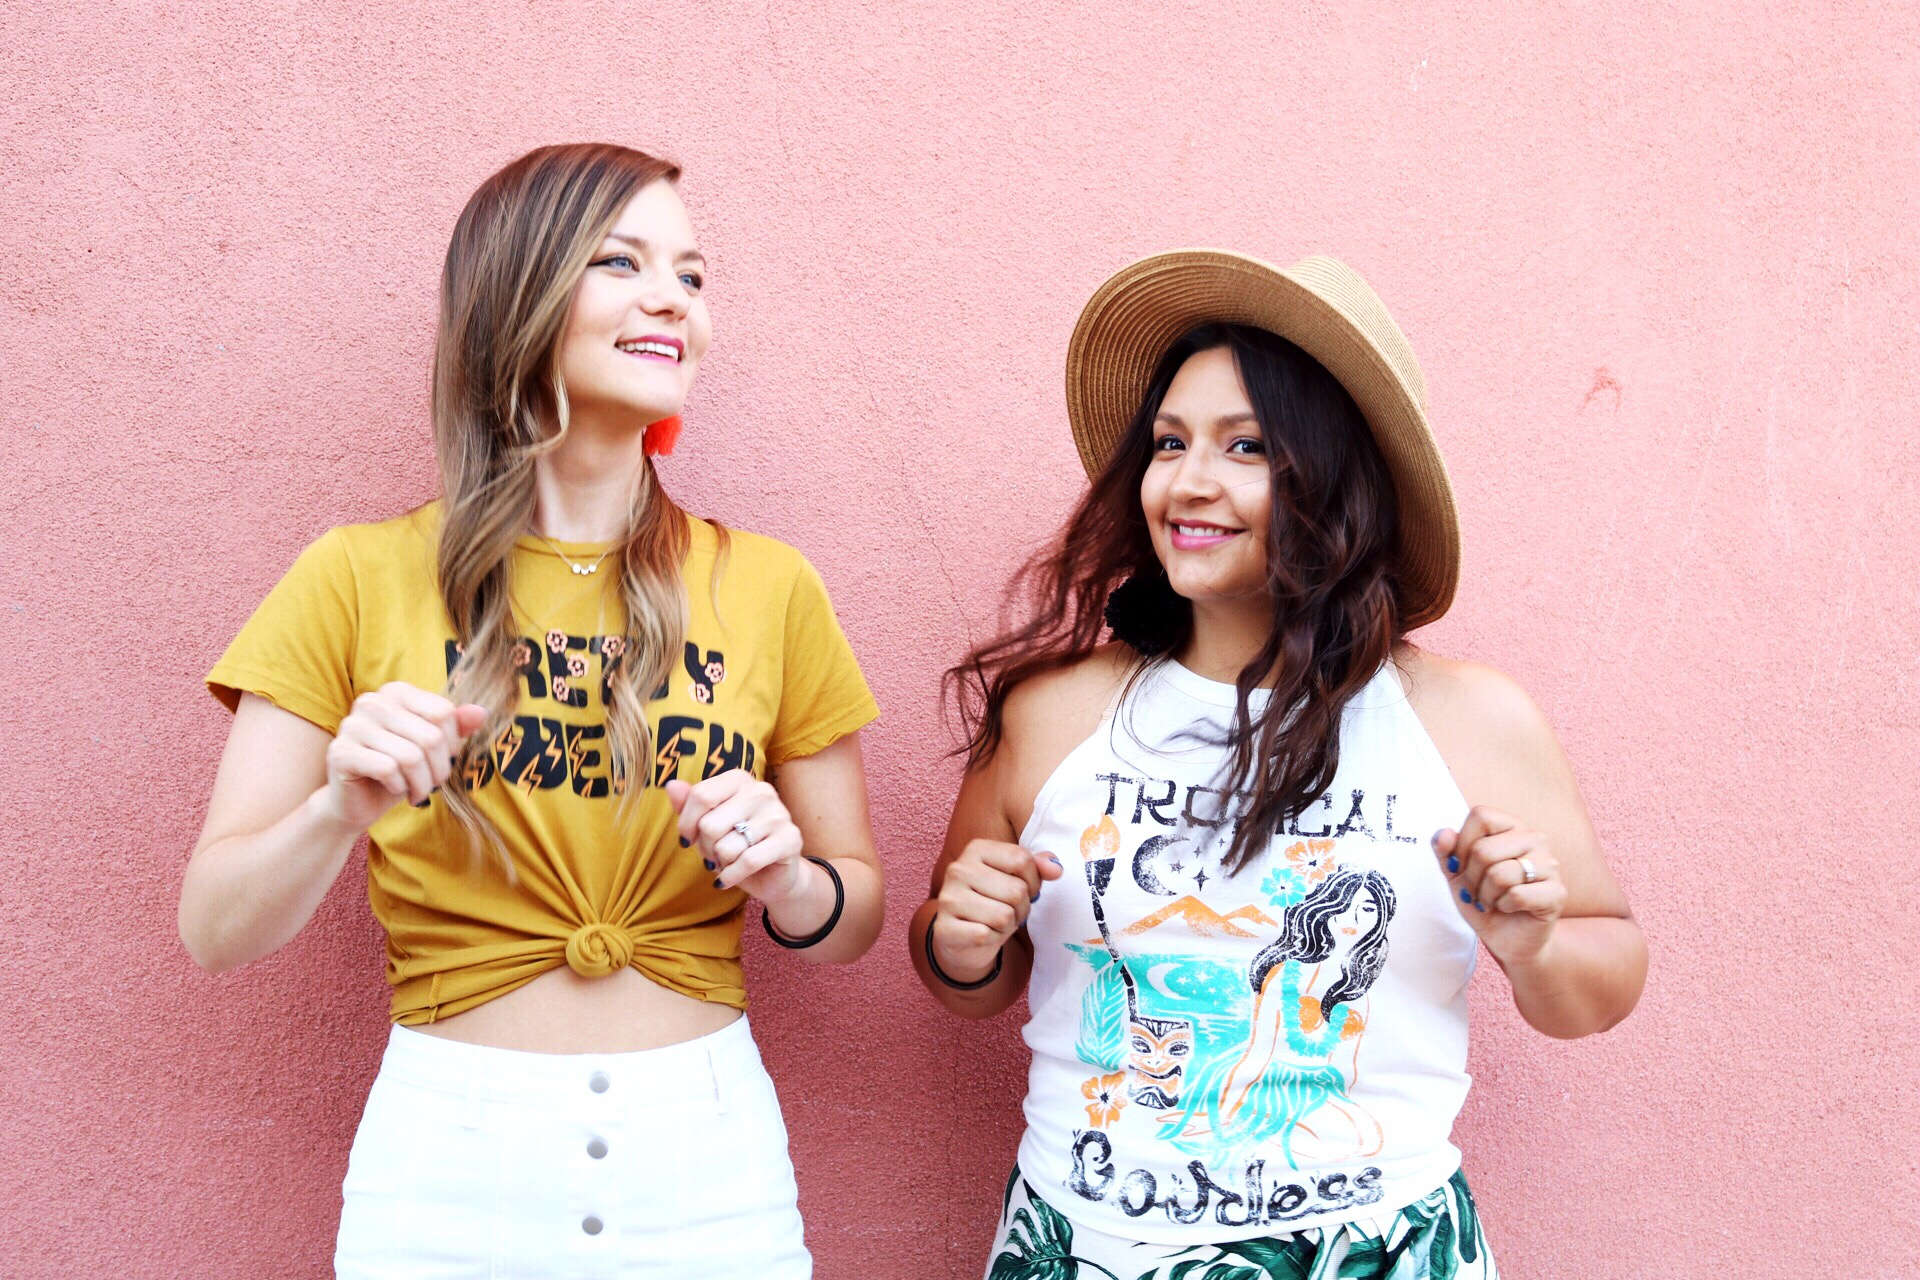 Best friends dance together forever/ Summer fashion inspiration by Dazey L.A.